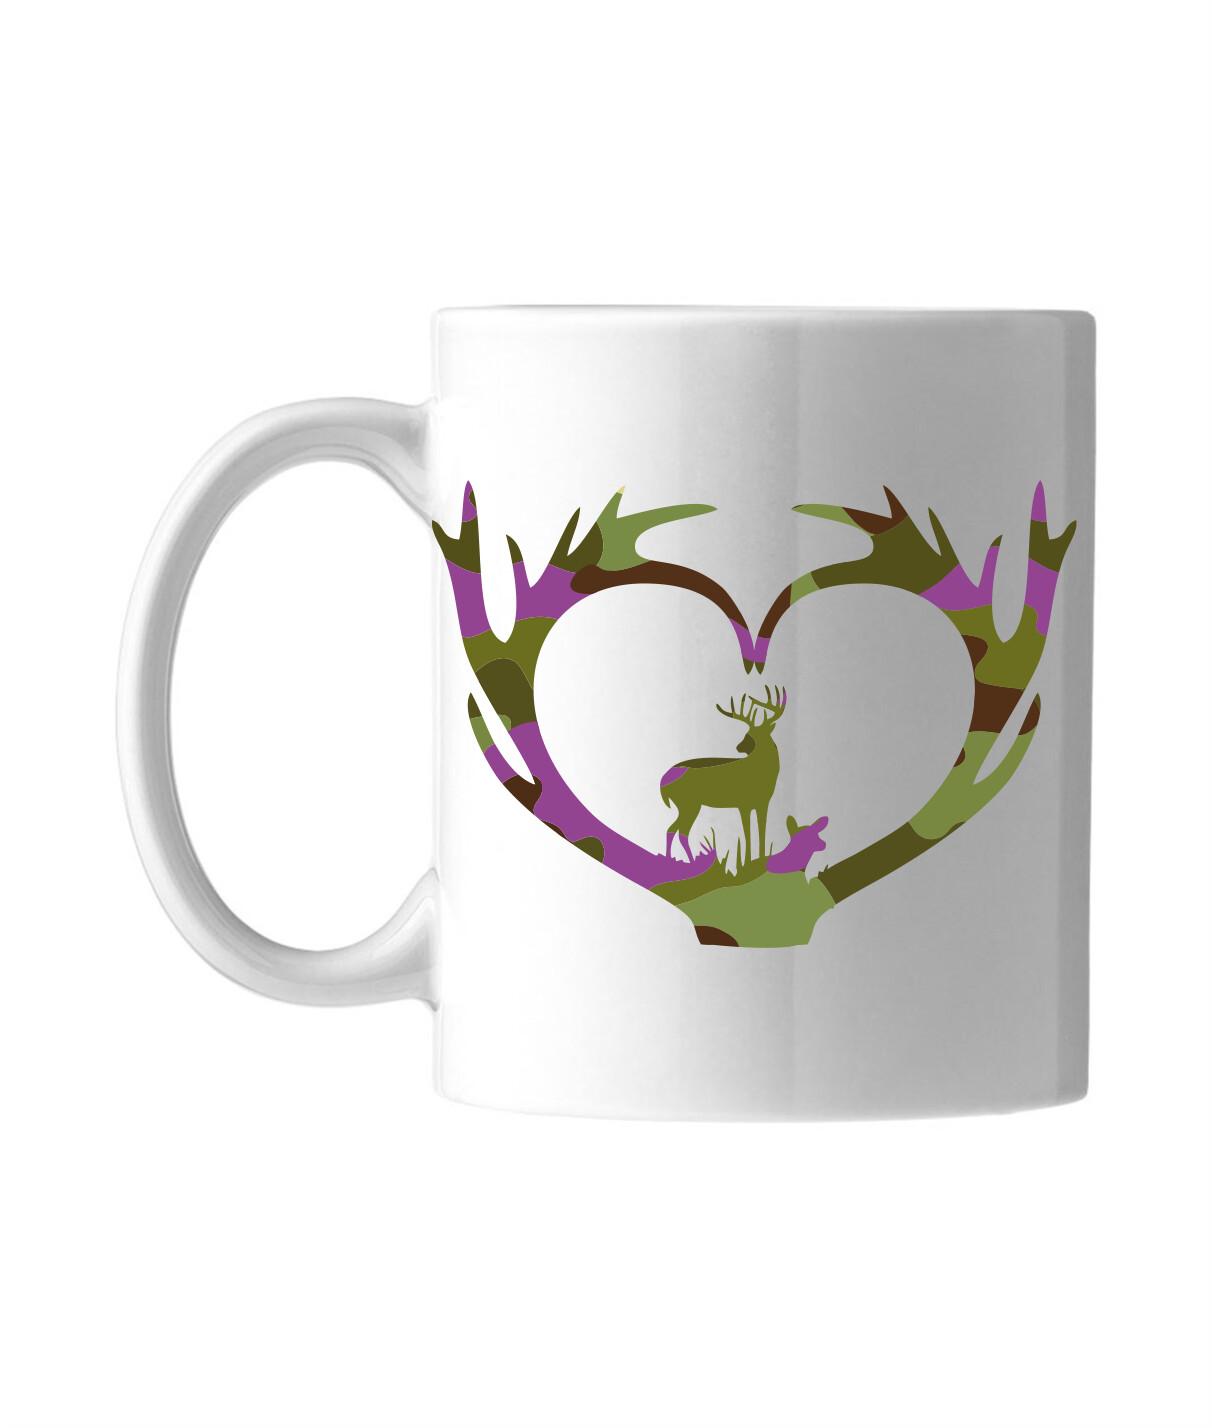 Krus med camouflage motiv - Kronhjorte i lilla